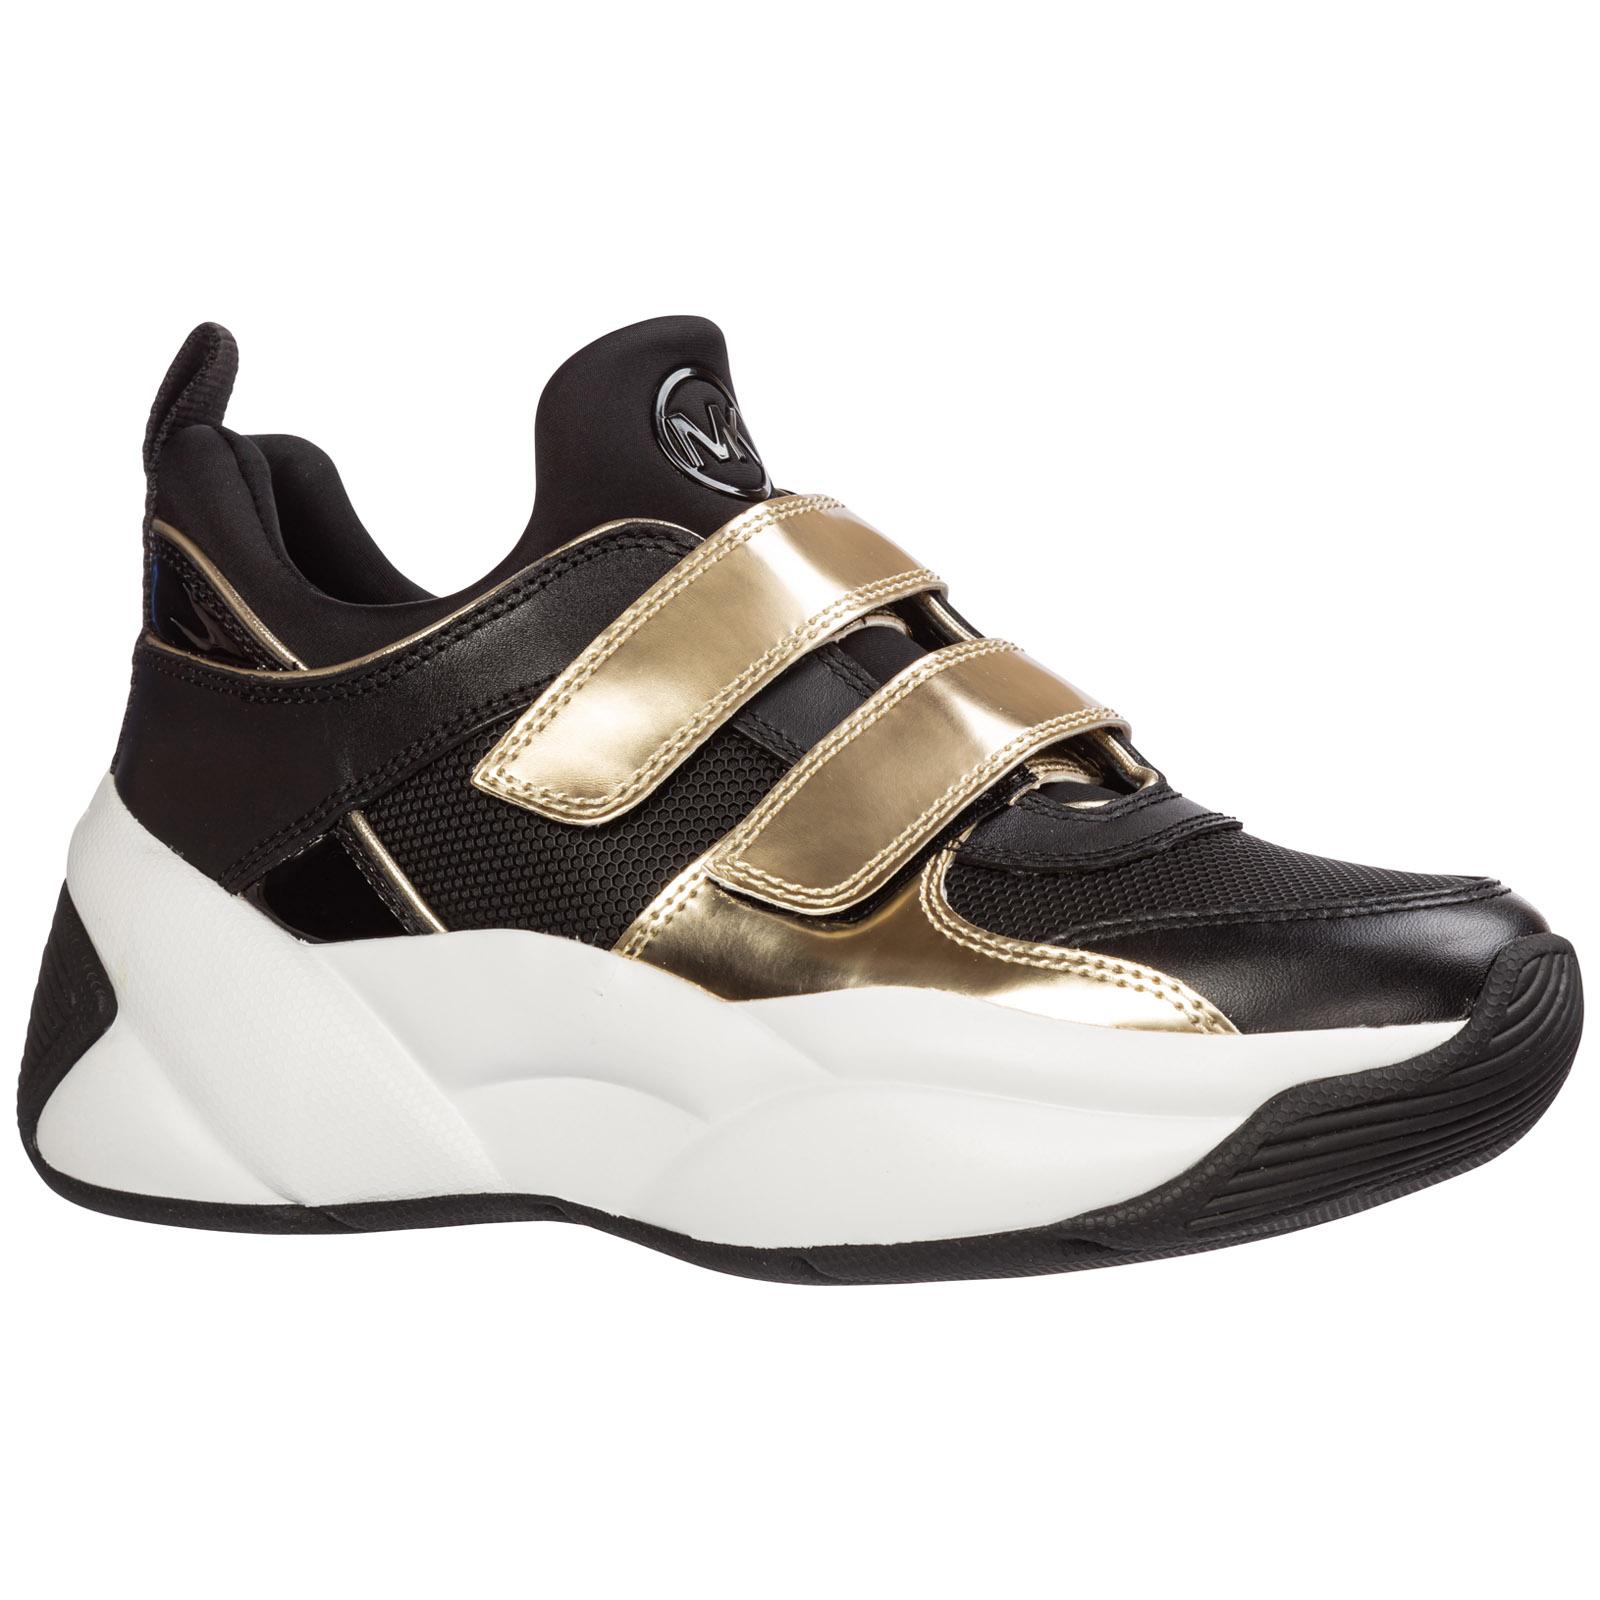 Sneakers Michael Kors keeley 43F9KEFS5D